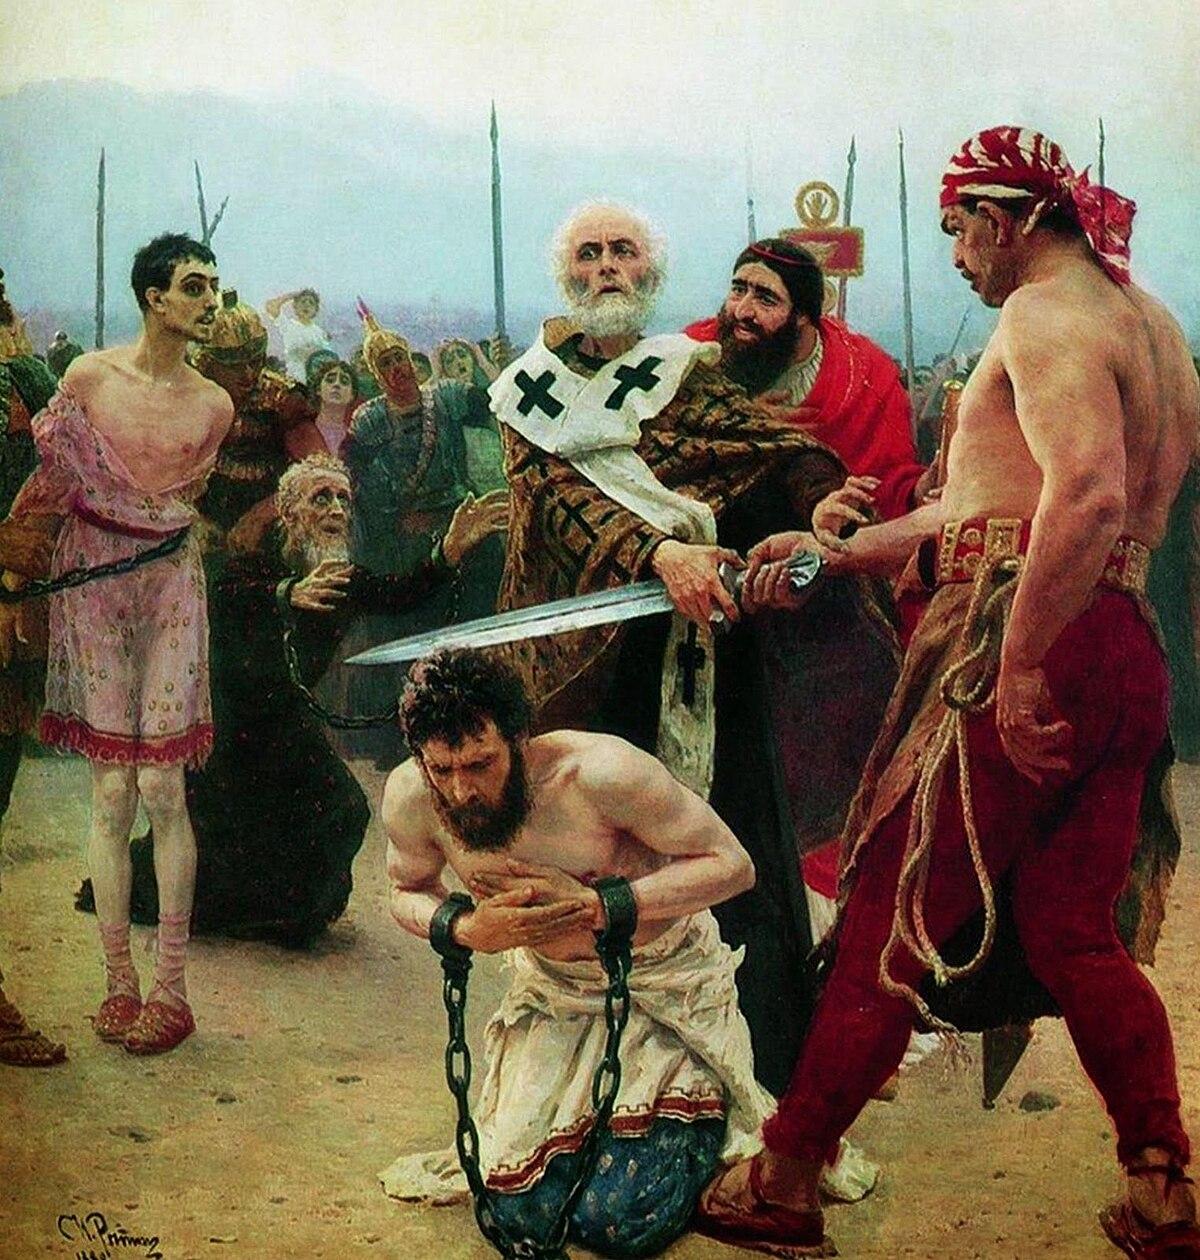 Ilja Jefimowitsch Repin - Saint Nicholas of Myra saves three innocents from death.jpg